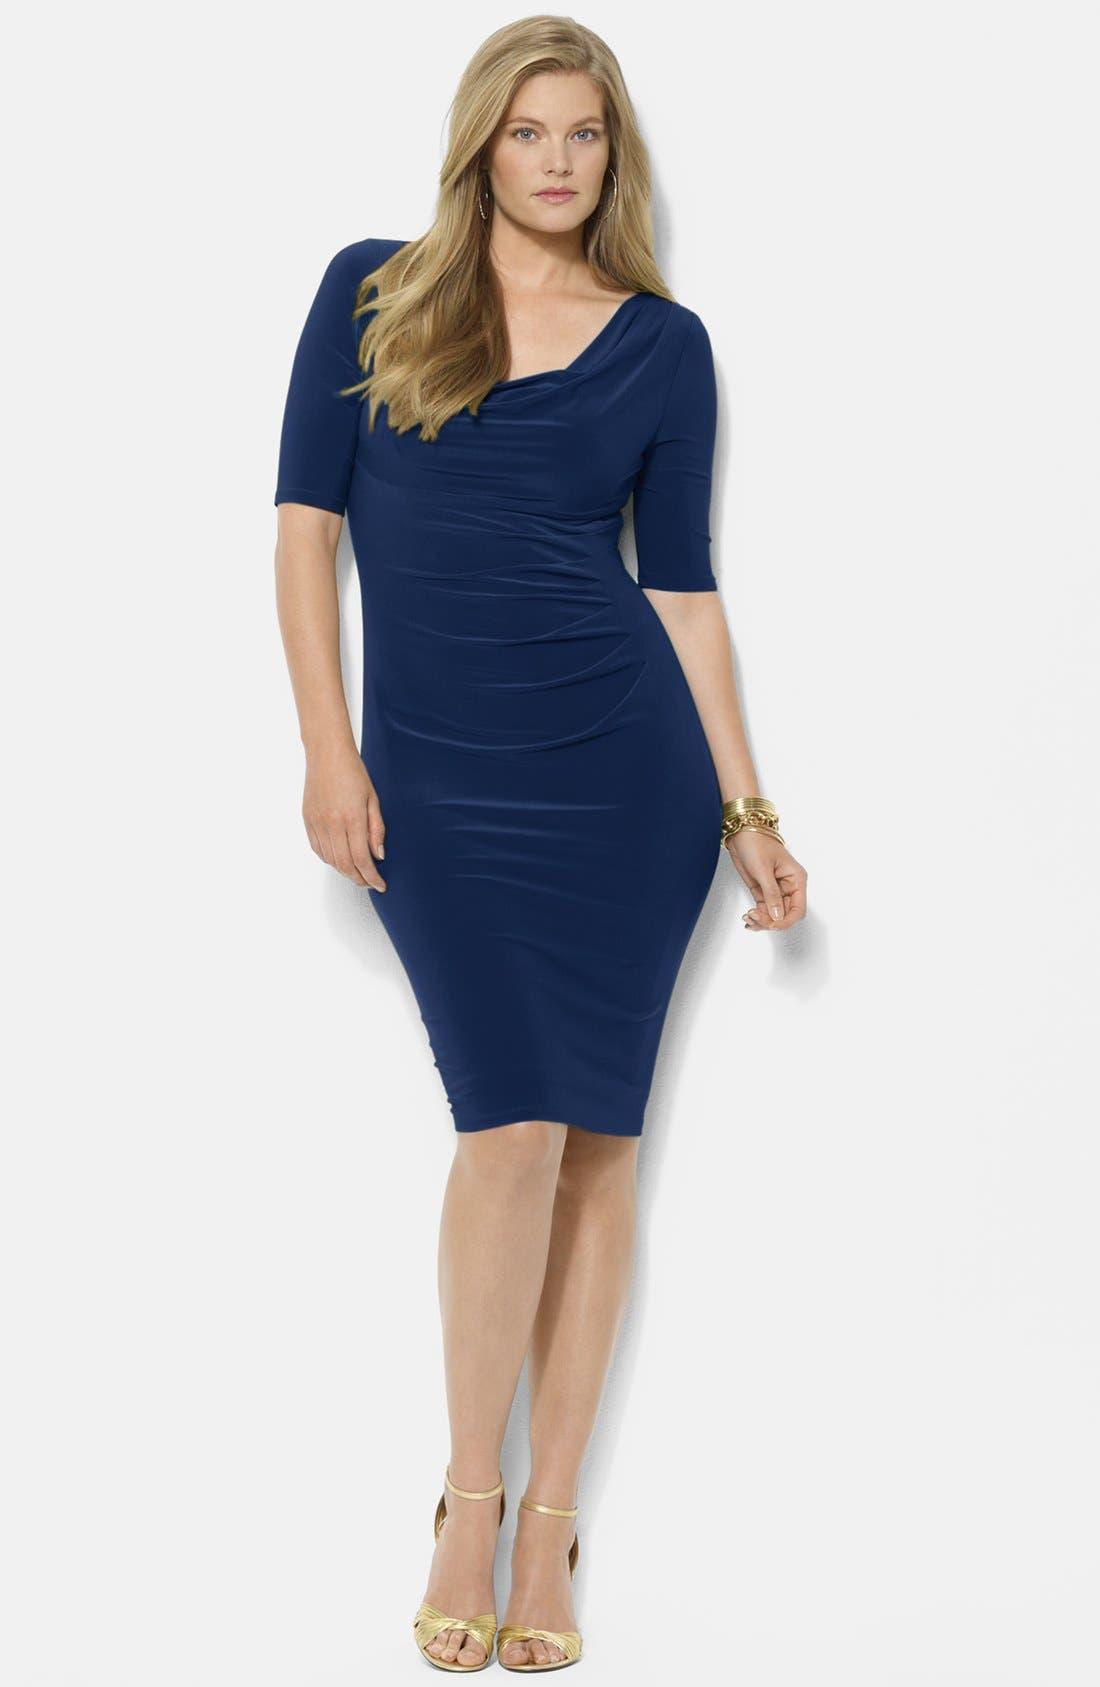 Alternate Image 1 Selected - Lauren Ralph Lauren Matte Jersey Cowl Neck Dress (Plus Size)